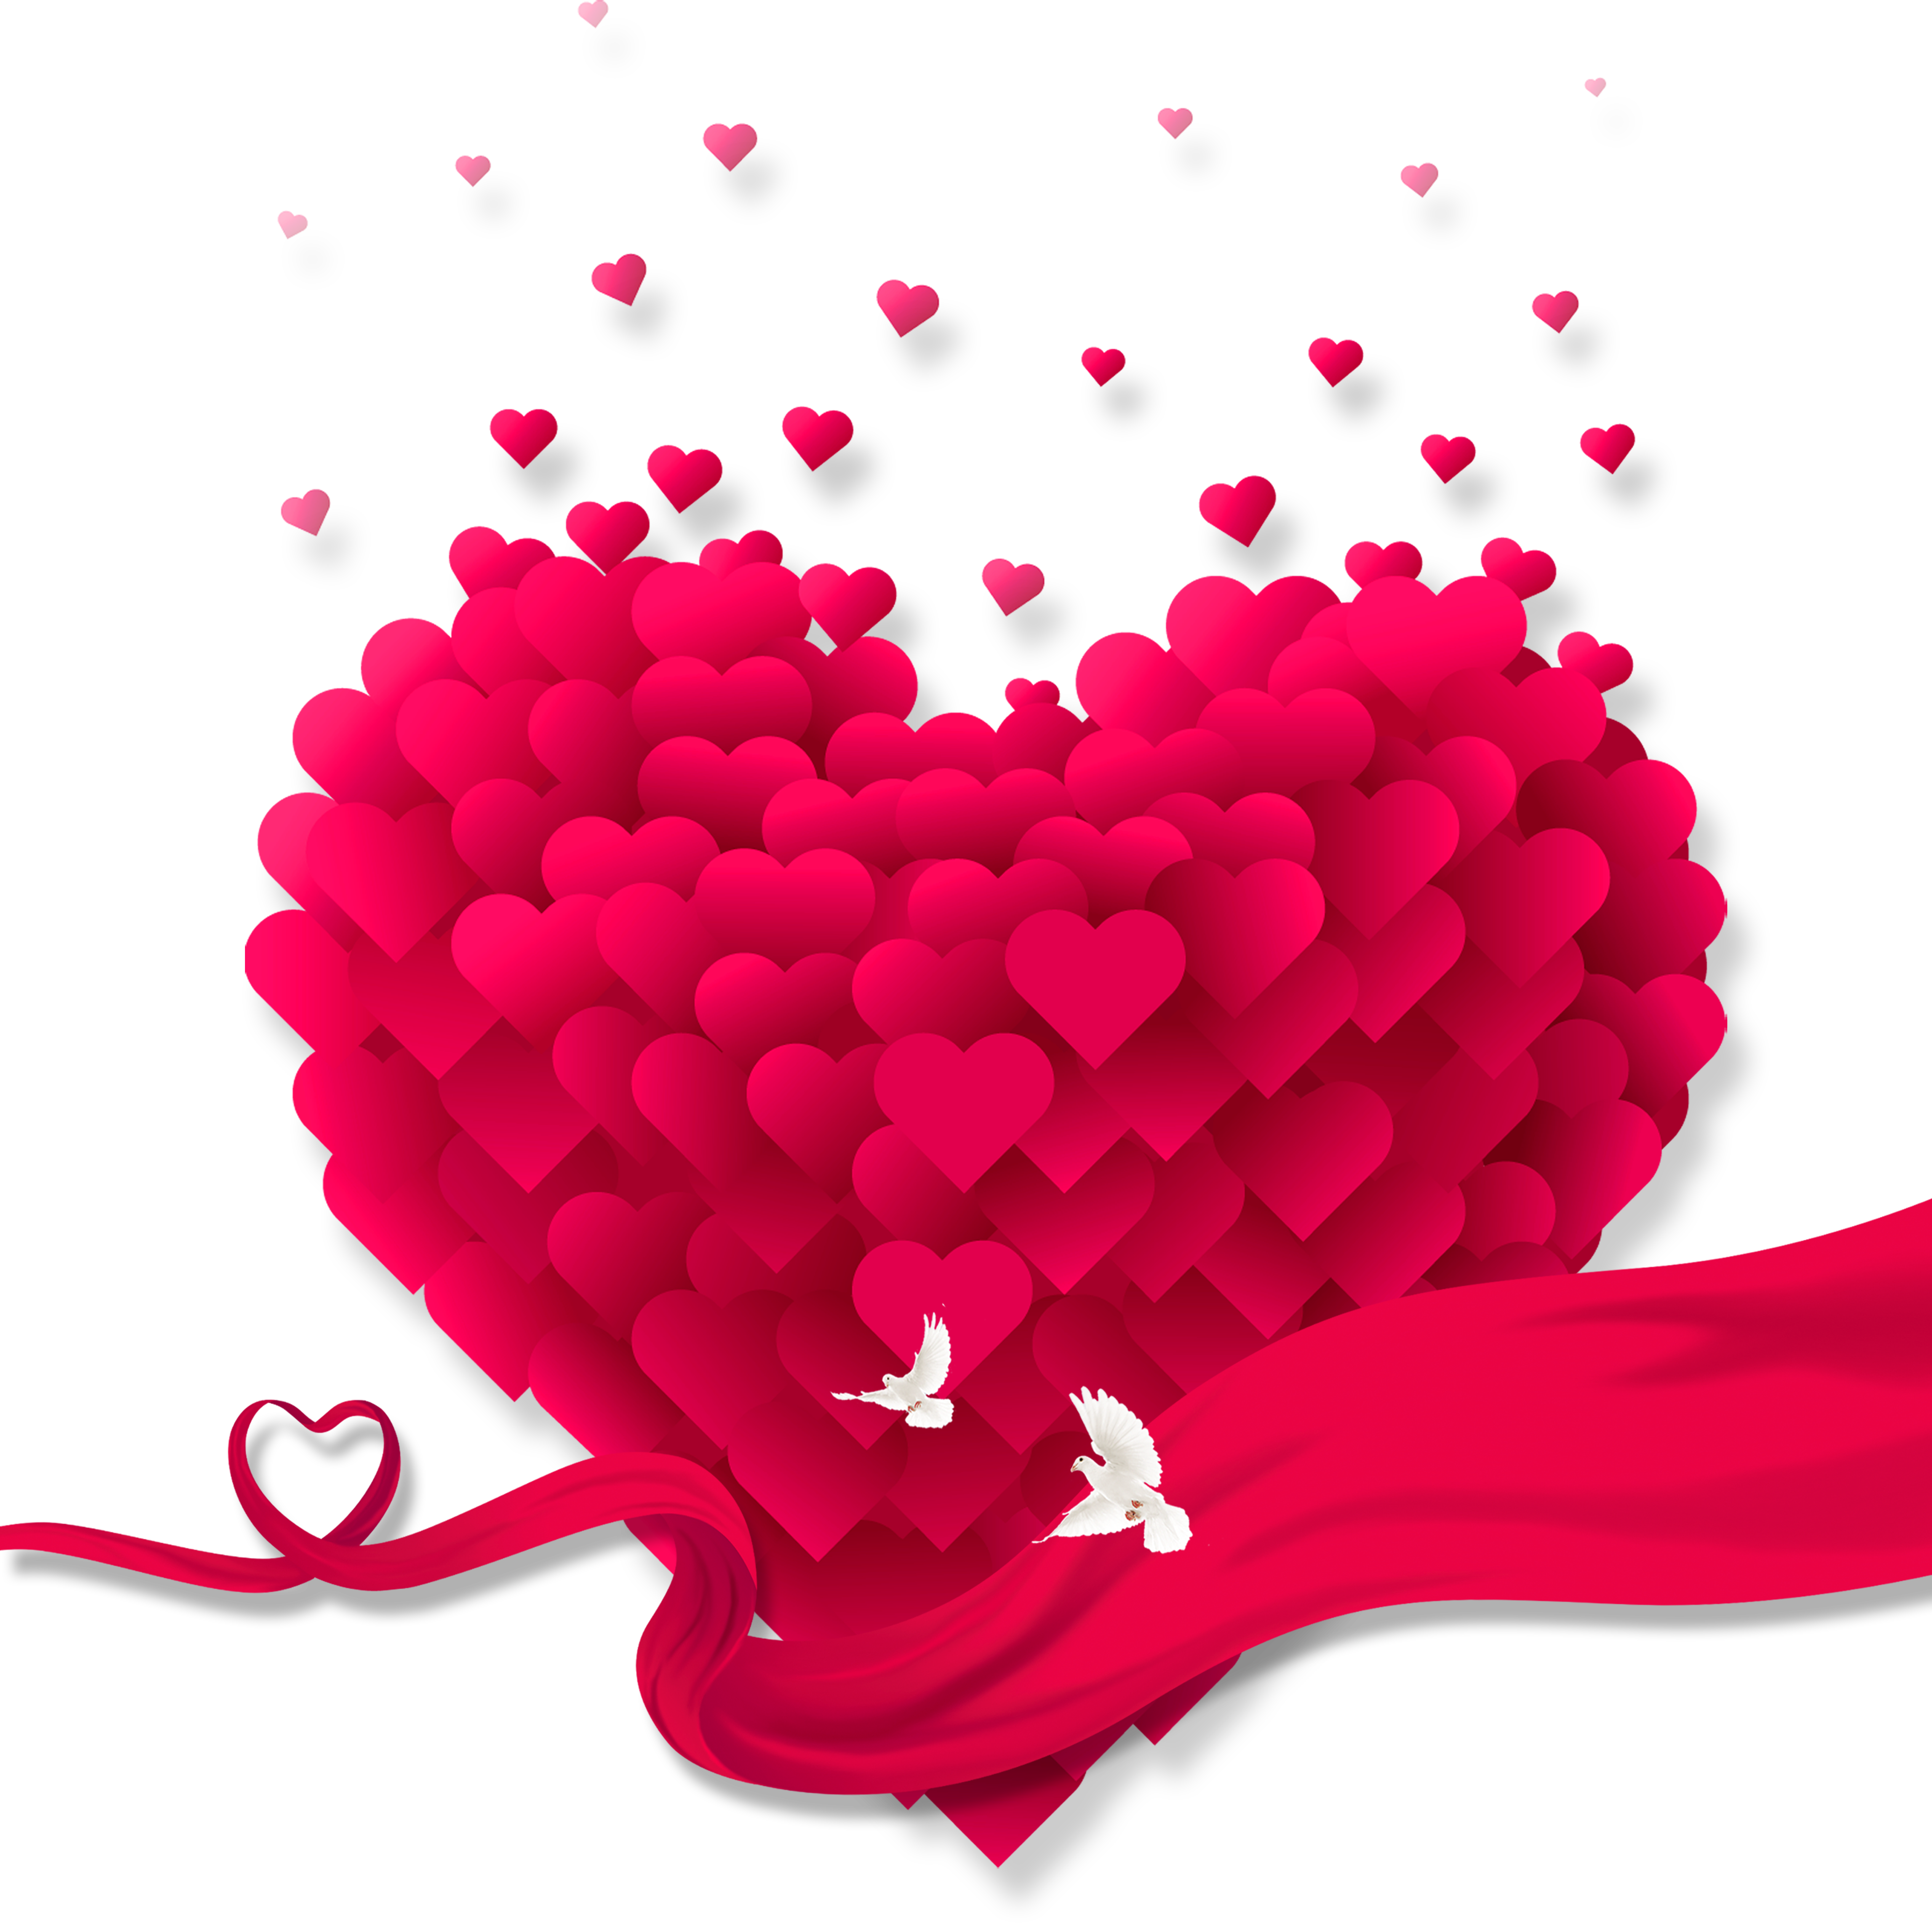 Hearts clipart watermelon. Heart clip art love